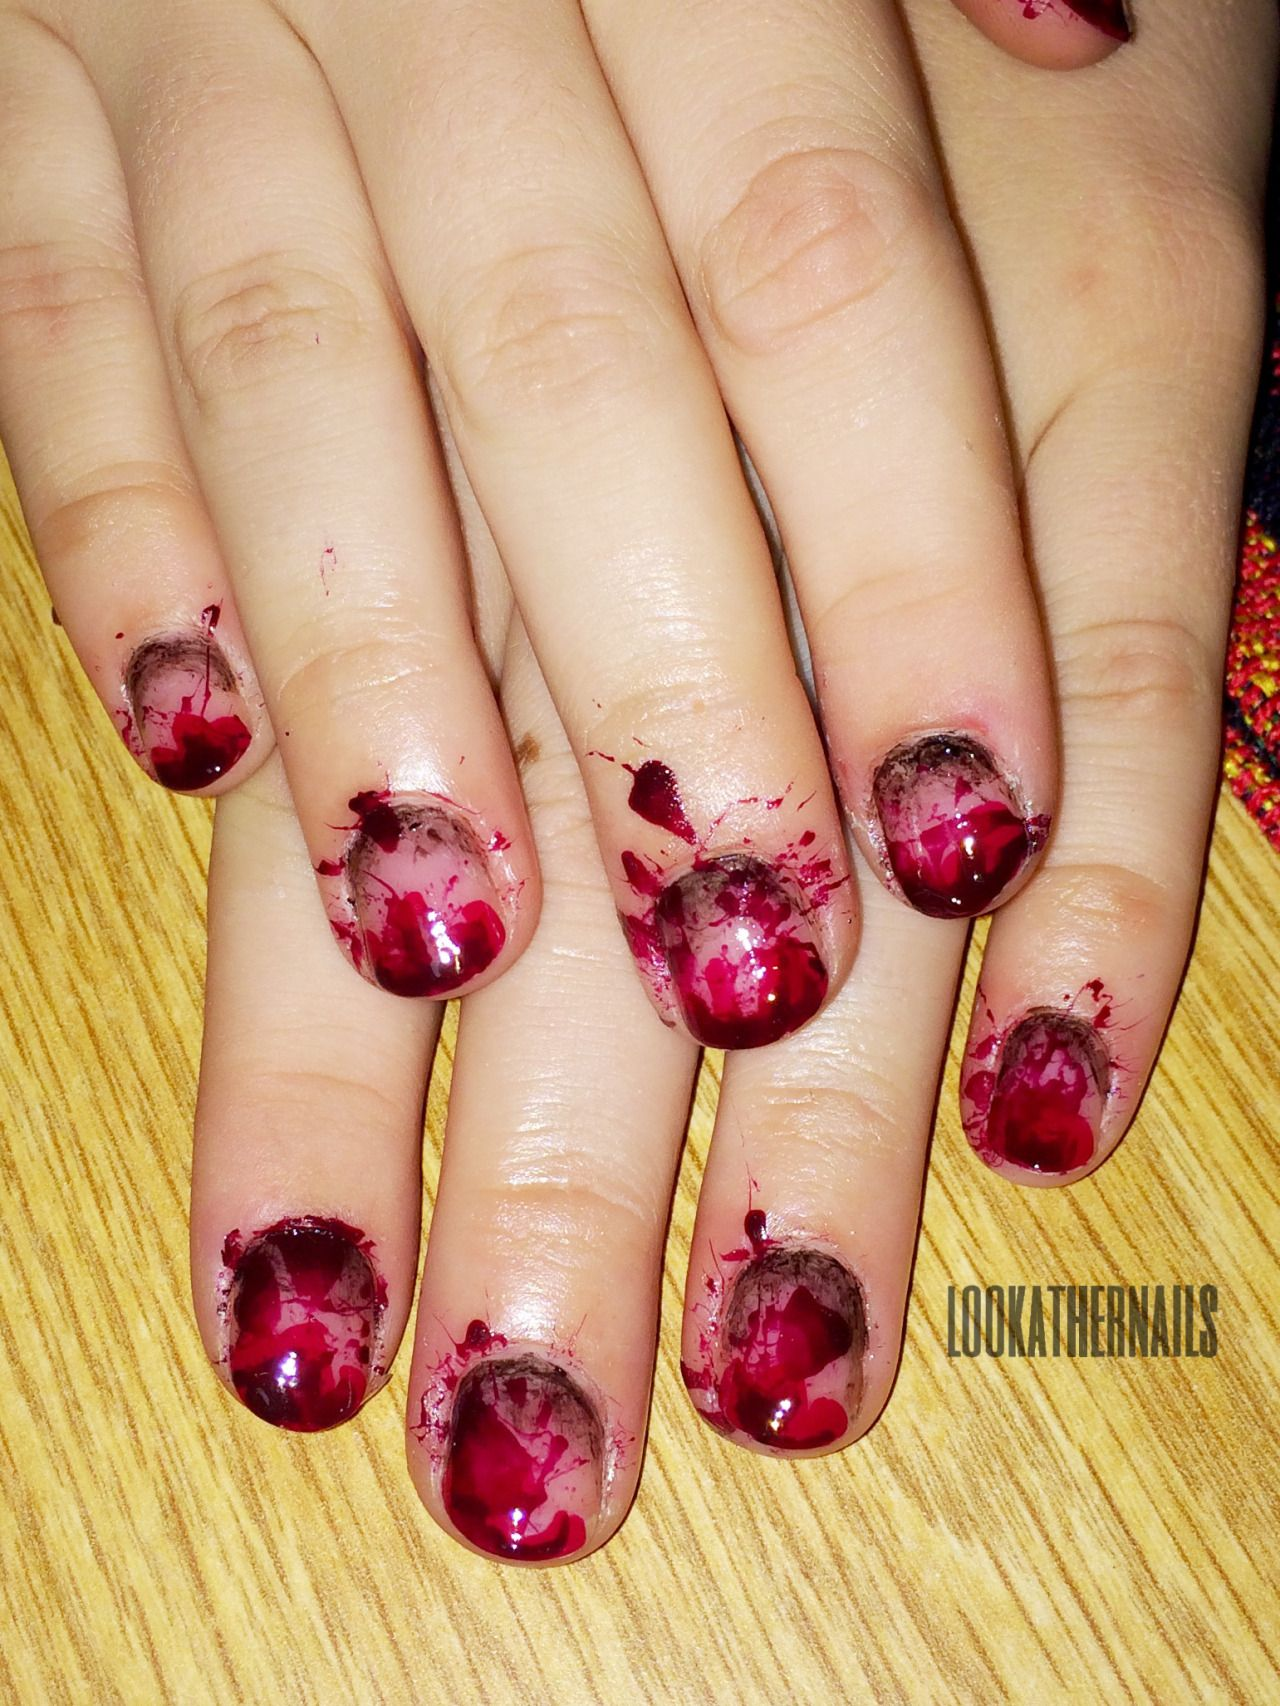 Blood splatter halloween nail art by lookathernails nails blood splatter halloween nail art by lookathernails prinsesfo Gallery